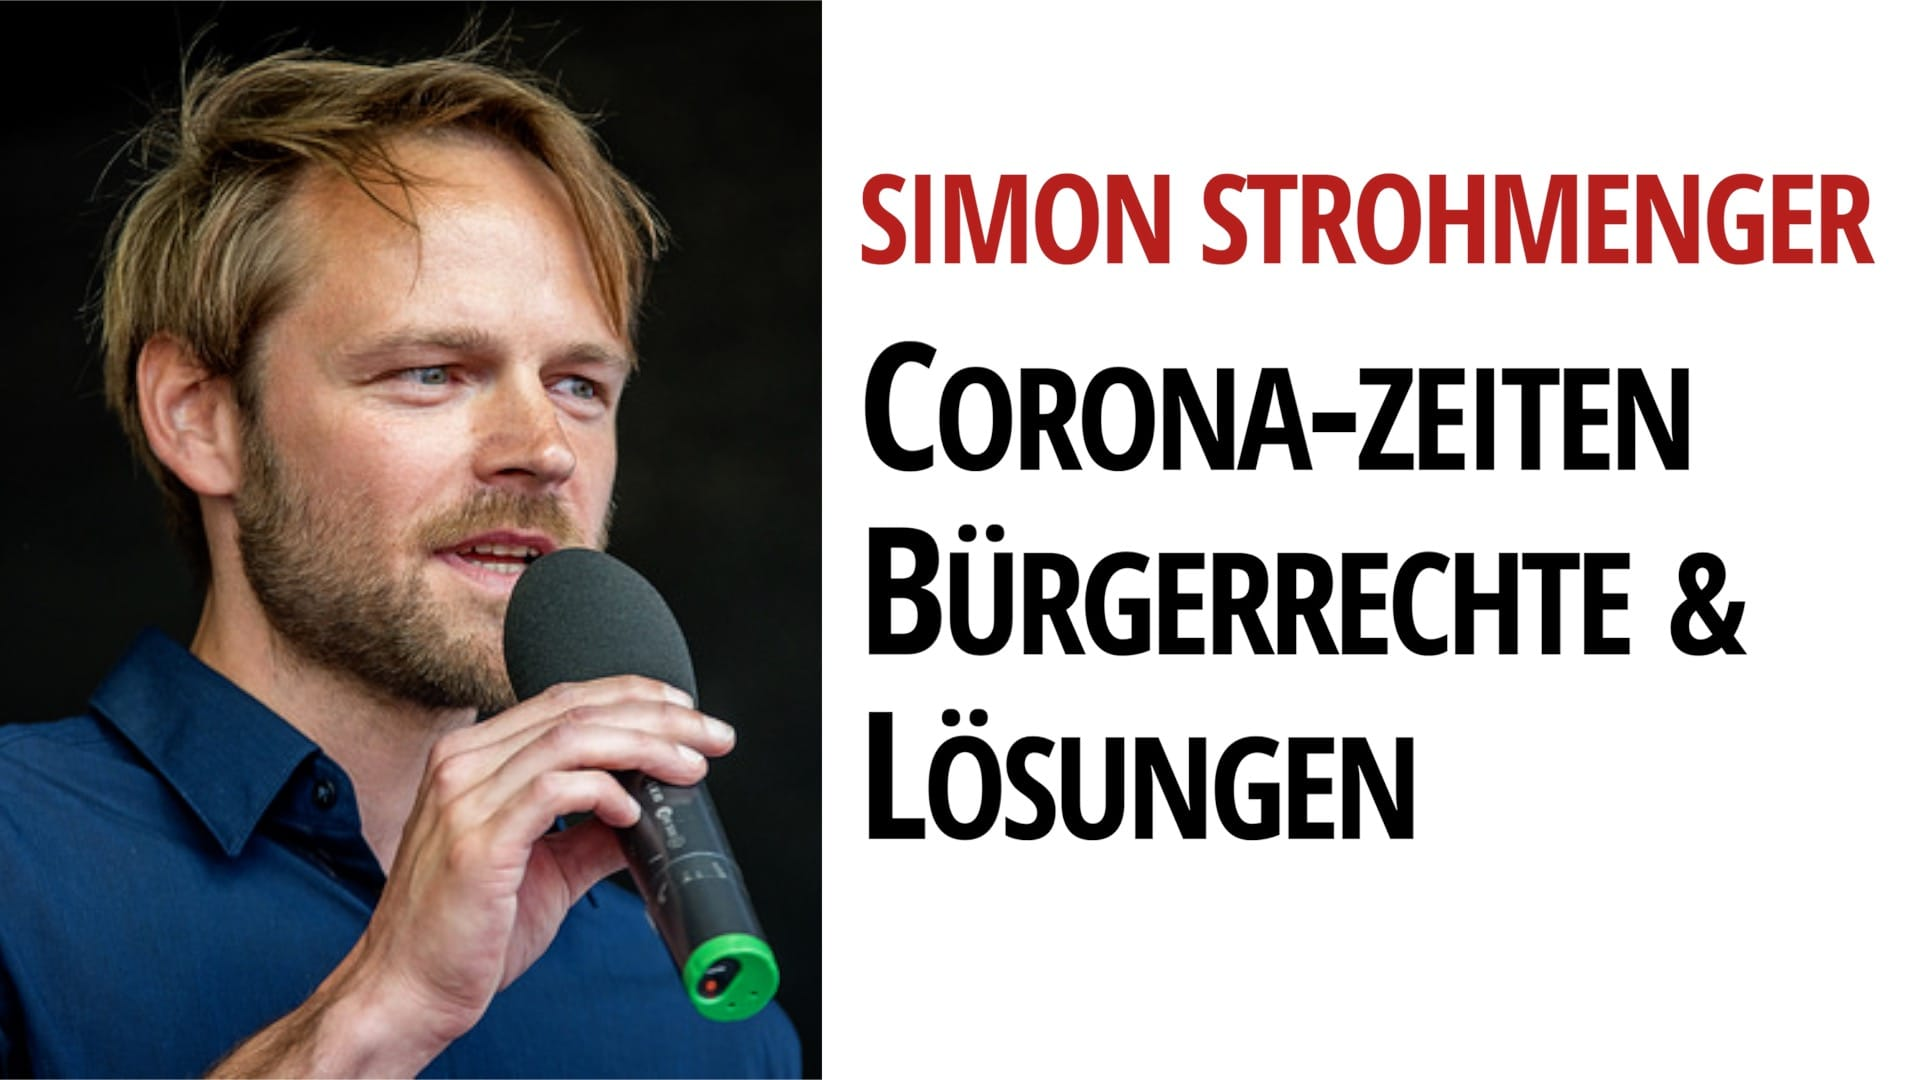 Simon Strohmenger - Demokratie, Bürgerrechte, Coronazeiten